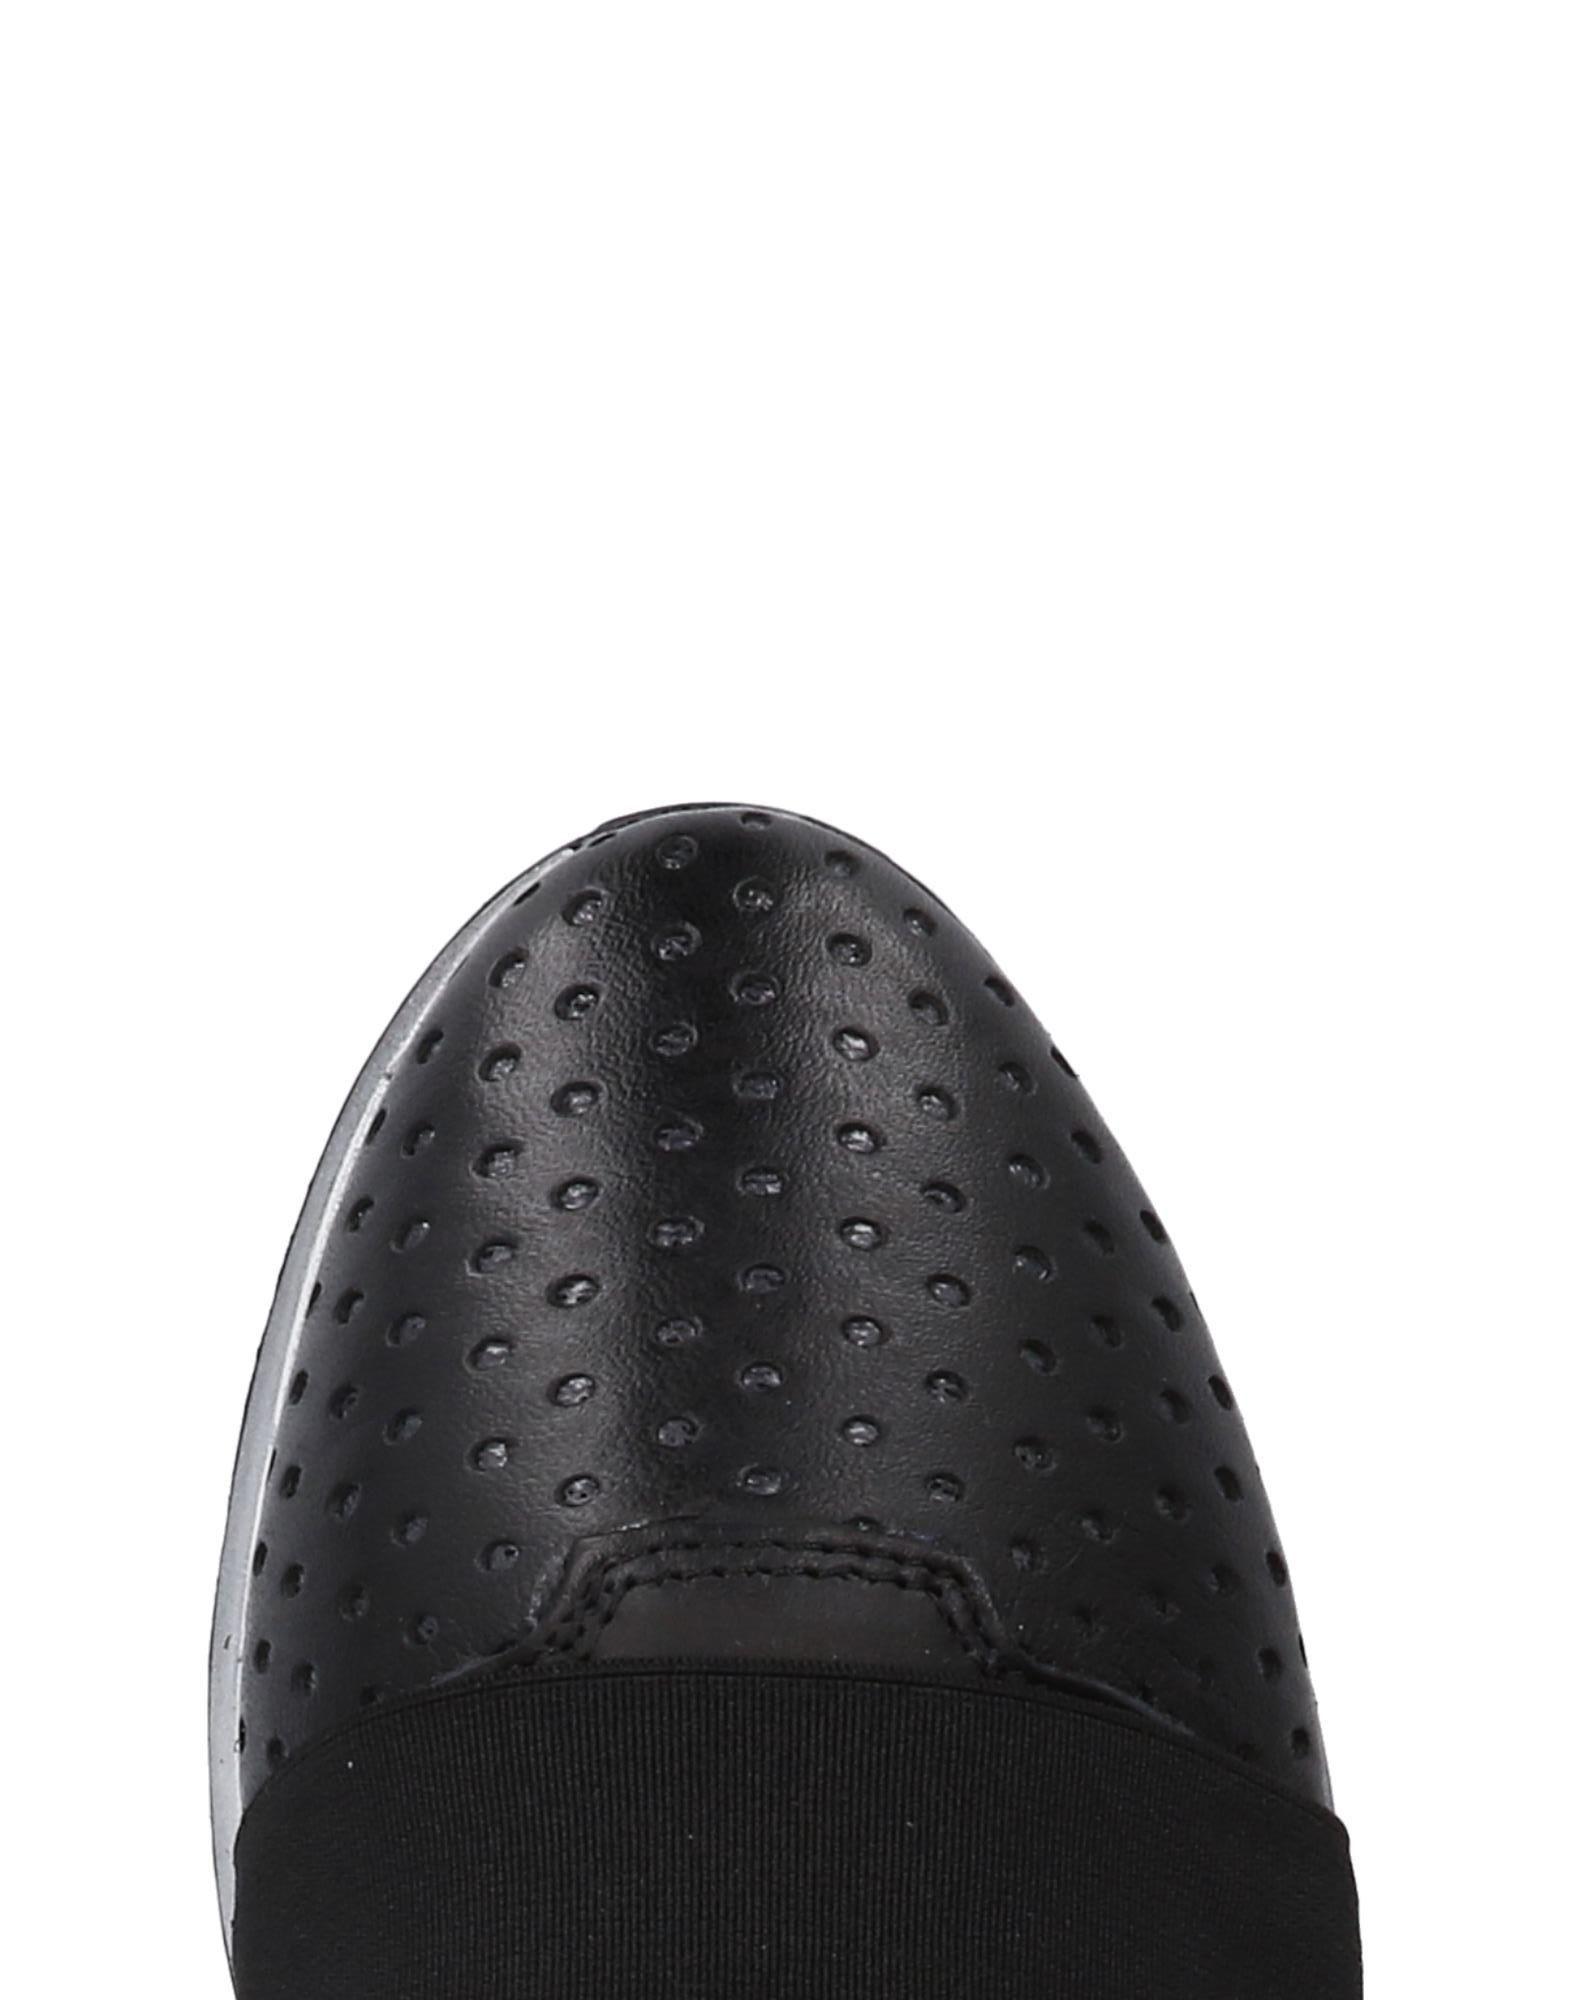 Piampiani Sneakers Damen Qualität  11491139GS Gute Qualität Damen beliebte Schuhe 2183c9